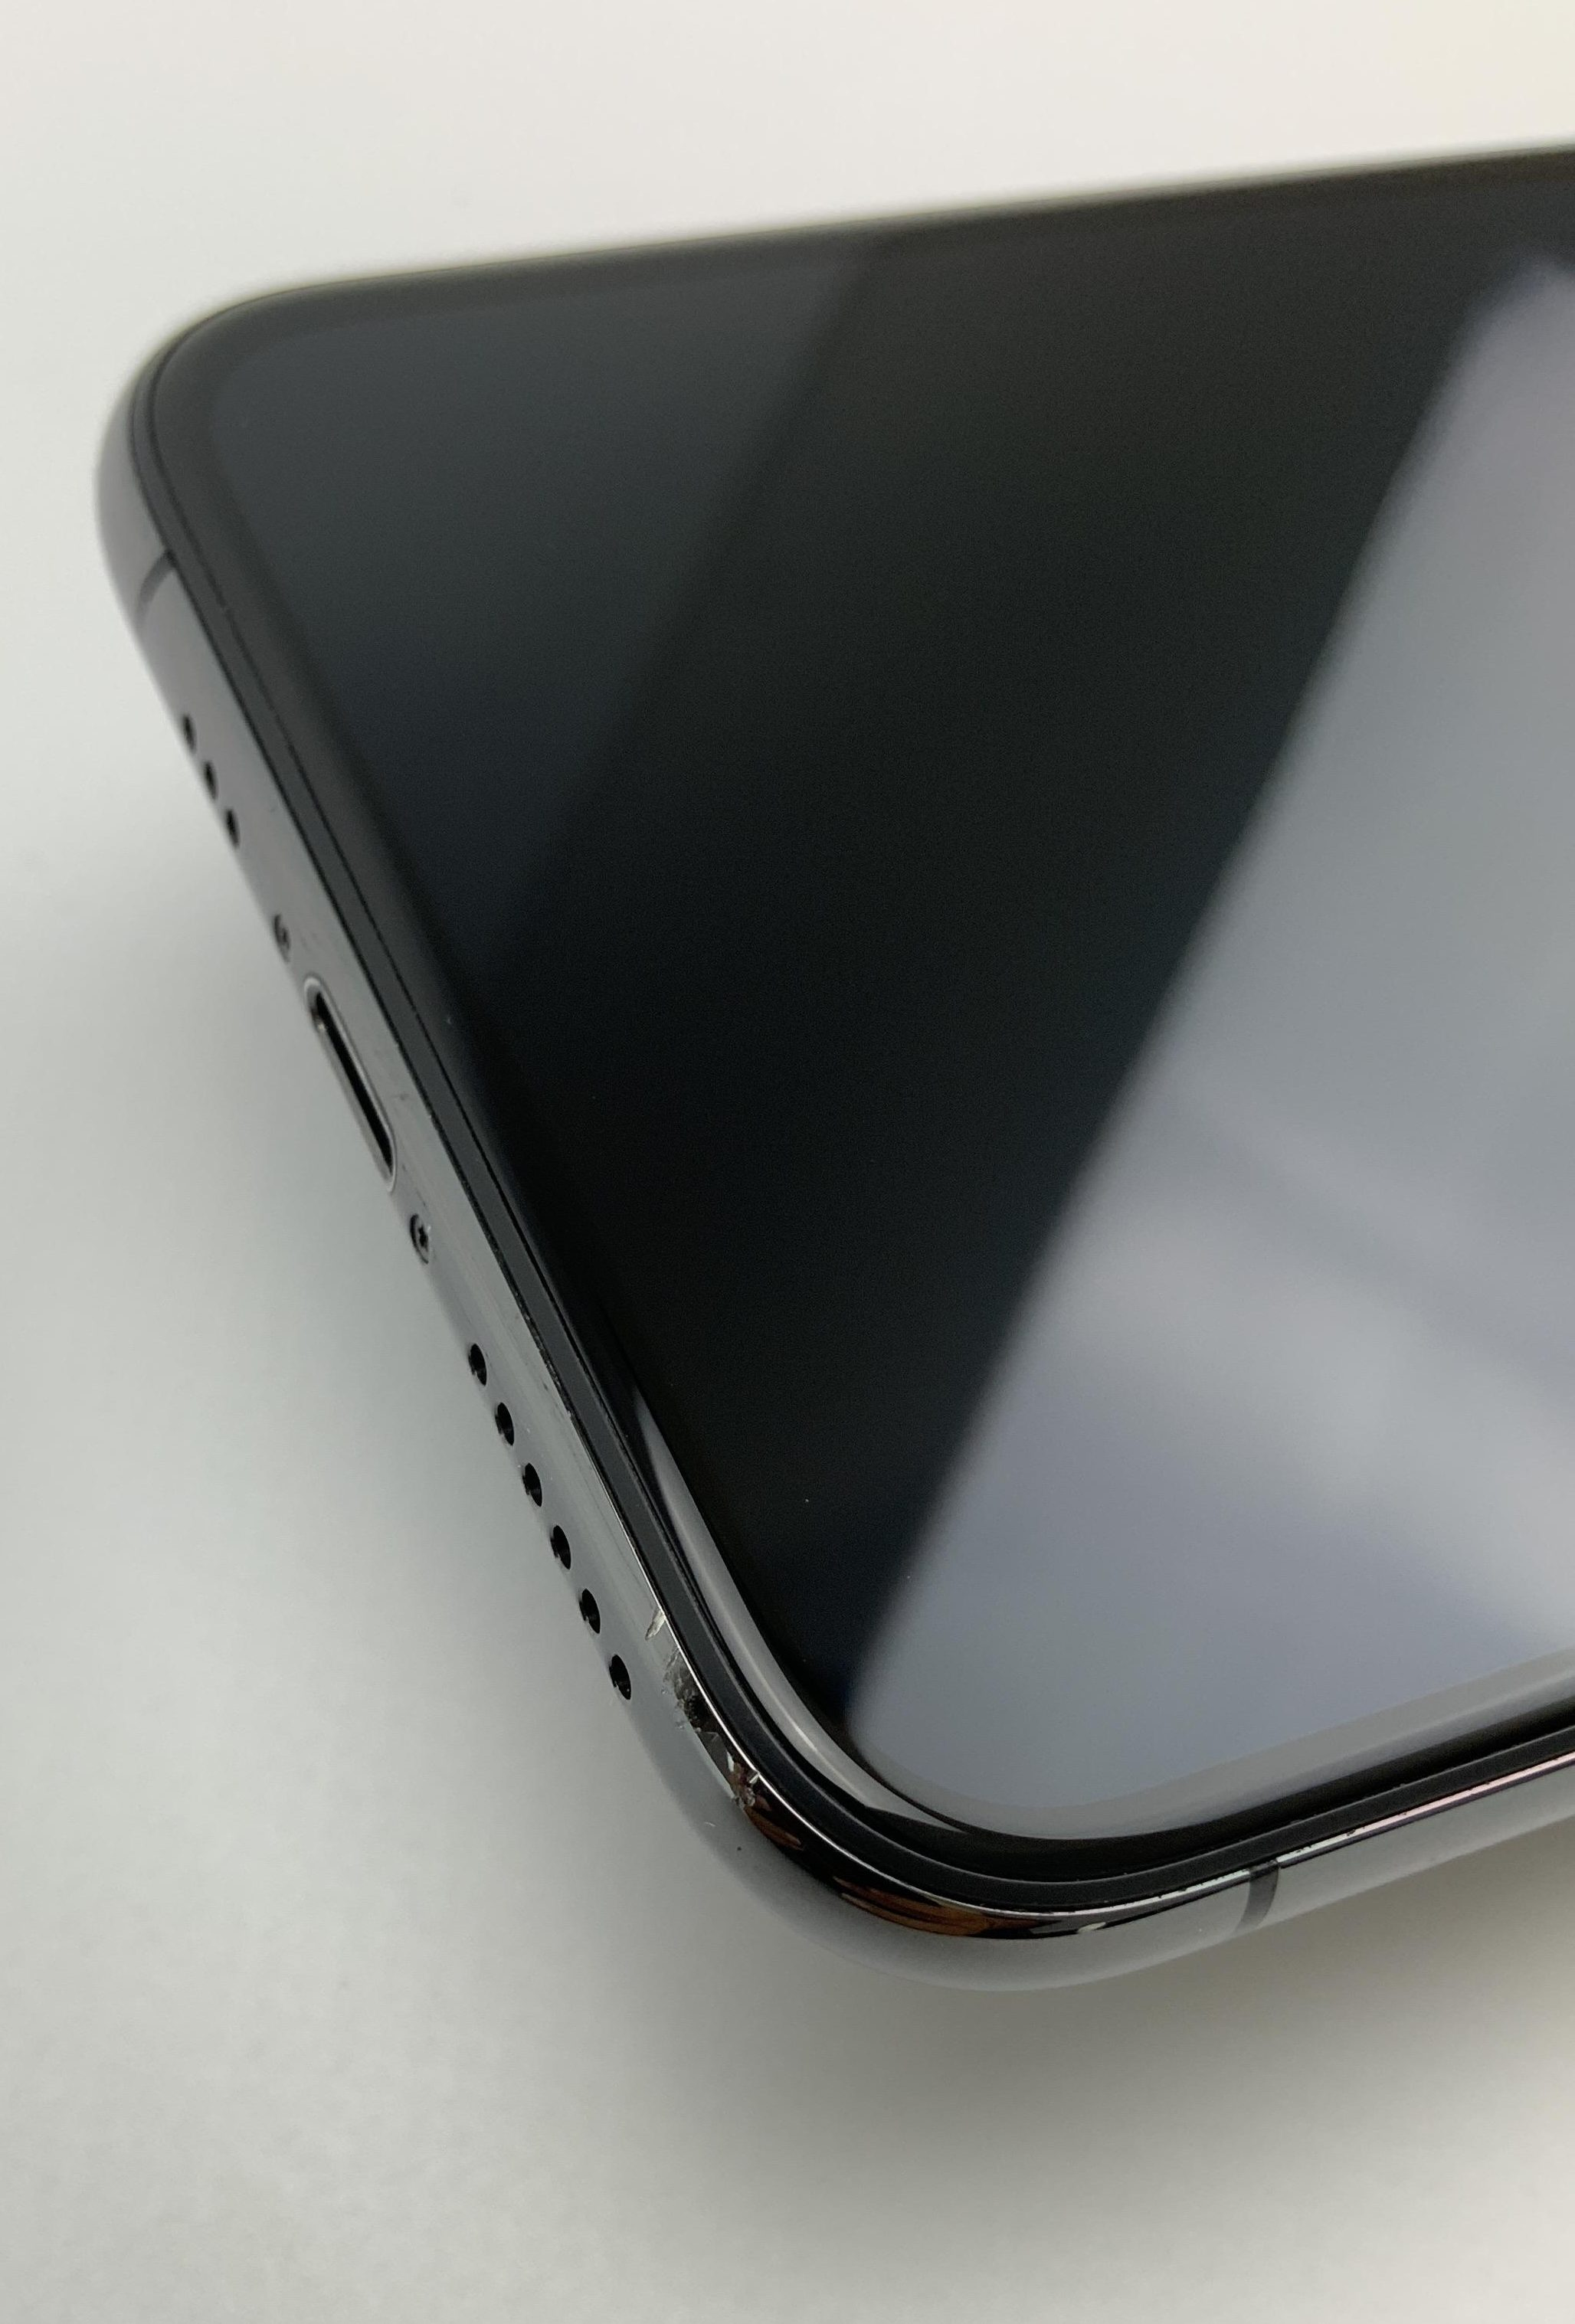 iPhone XS 64GB, 64GB, Space Gray, Bild 3